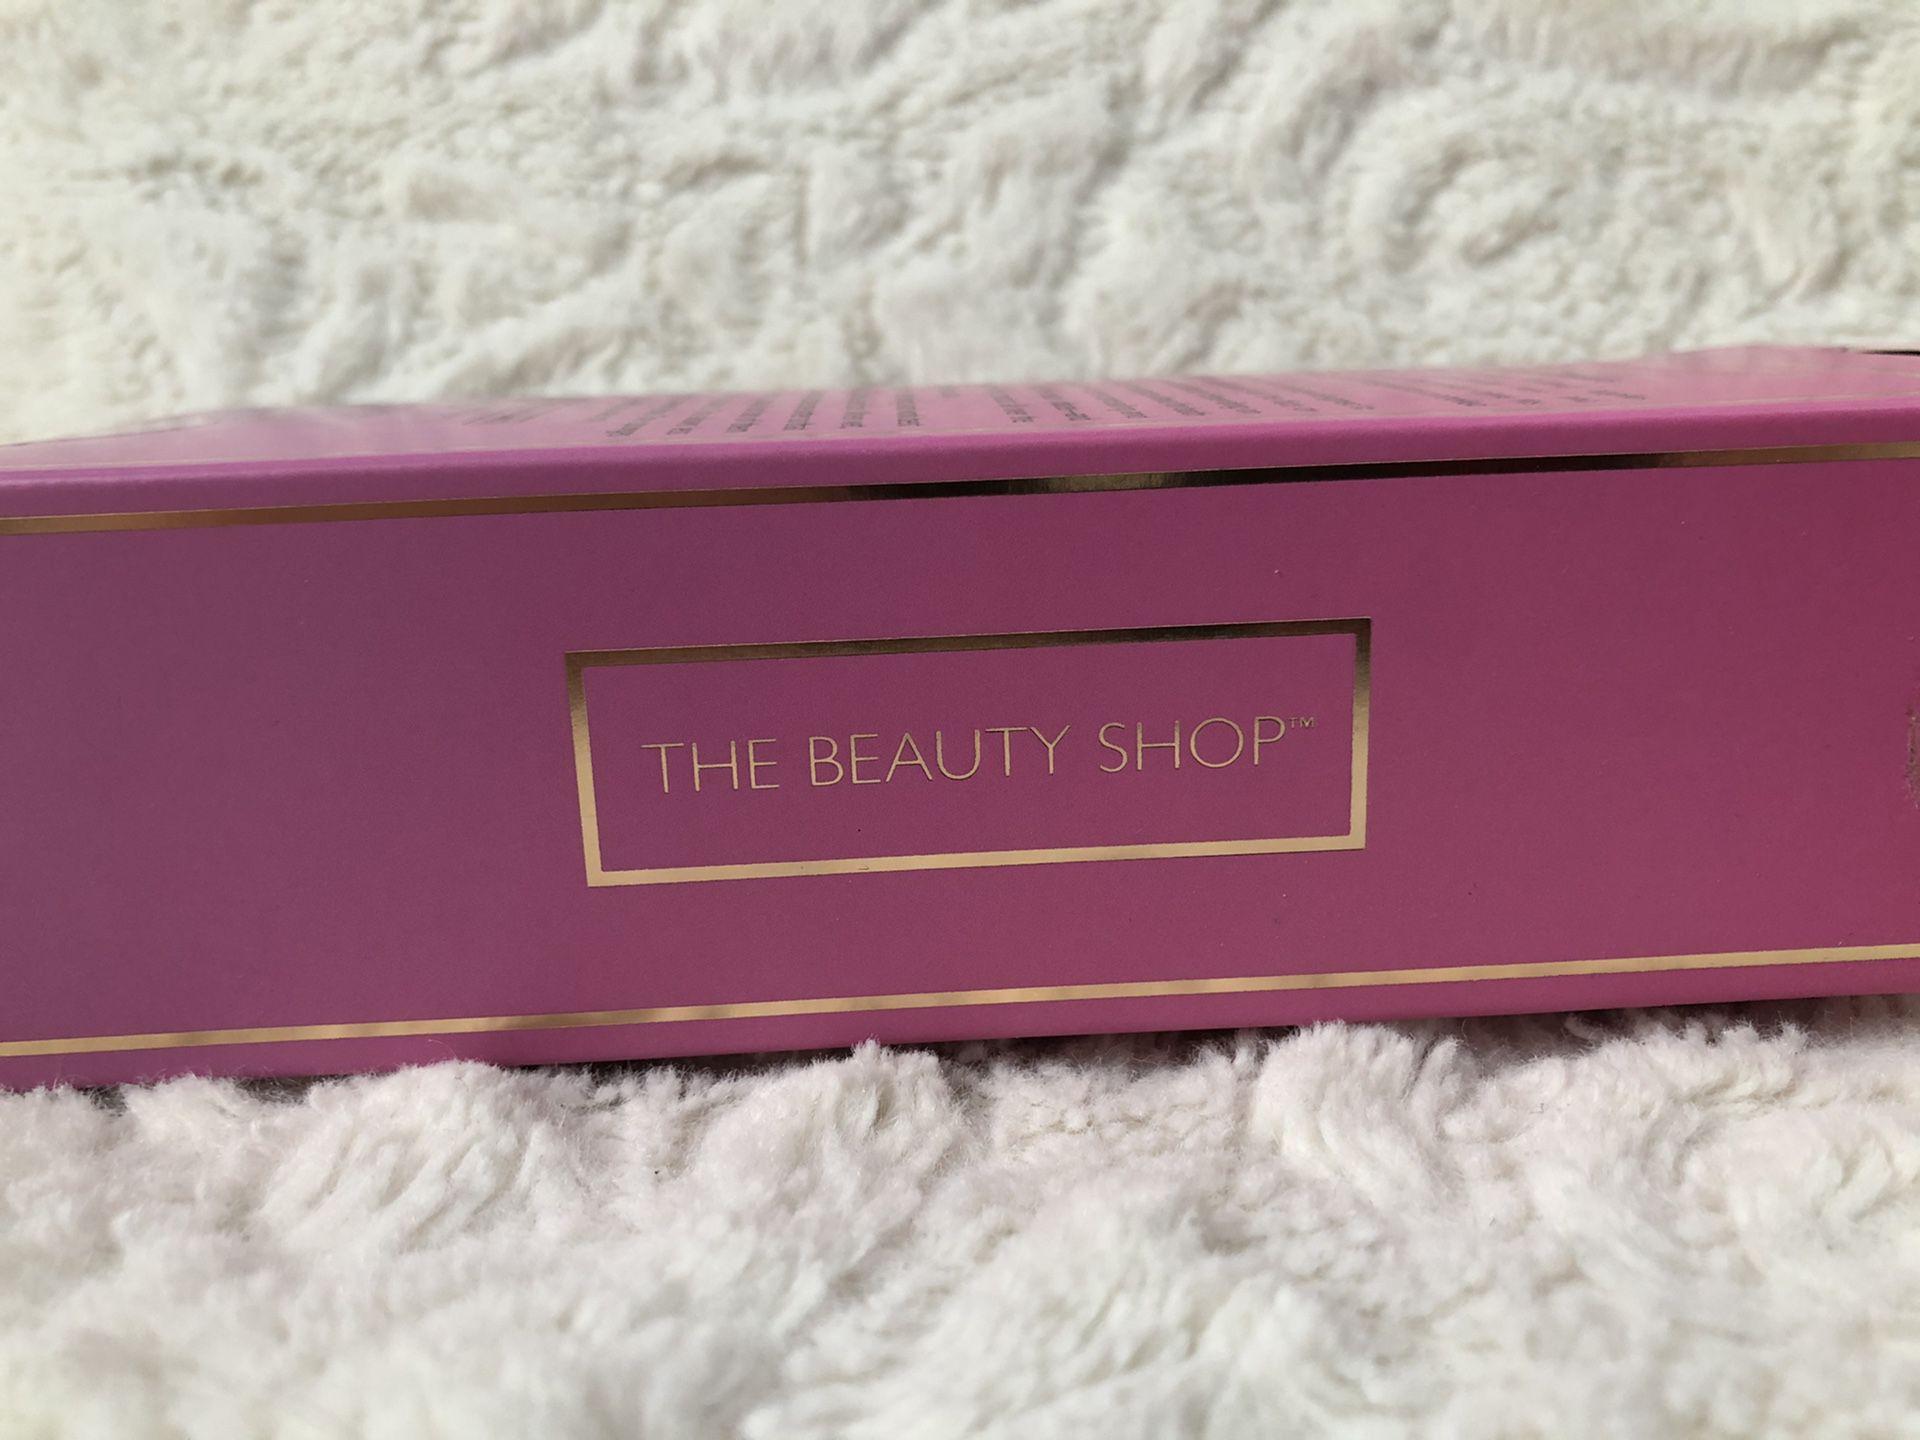 THE BEAUTY SHOP: Makeup blender